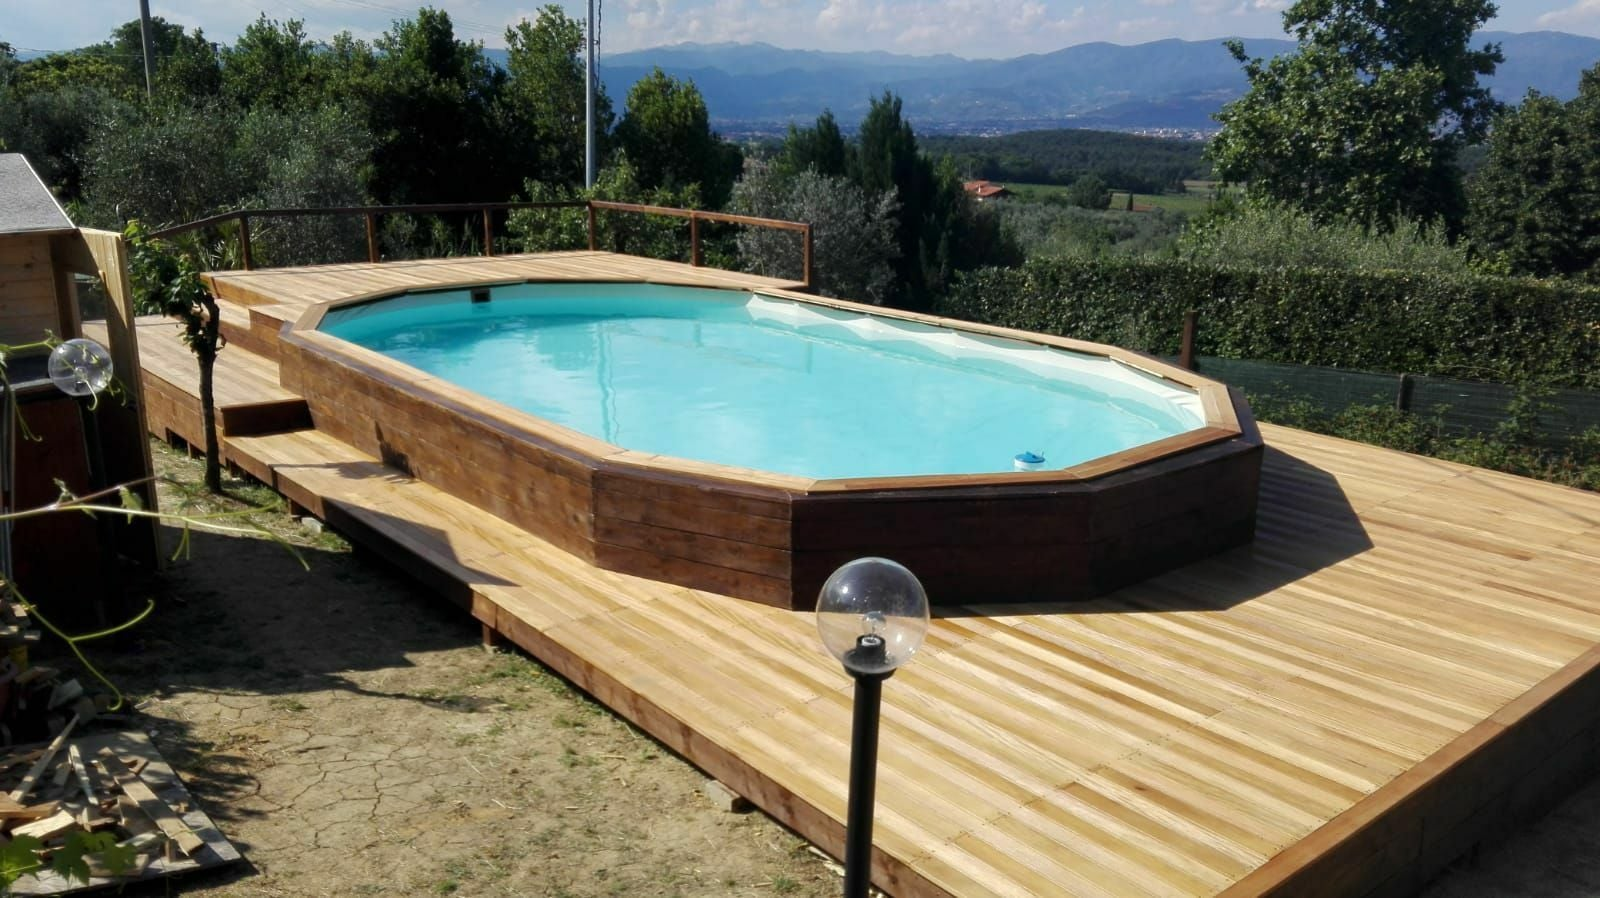 Acquazzurra piscine best minipiscine per interni prezzi - Piscine gia pronte prezzi ...